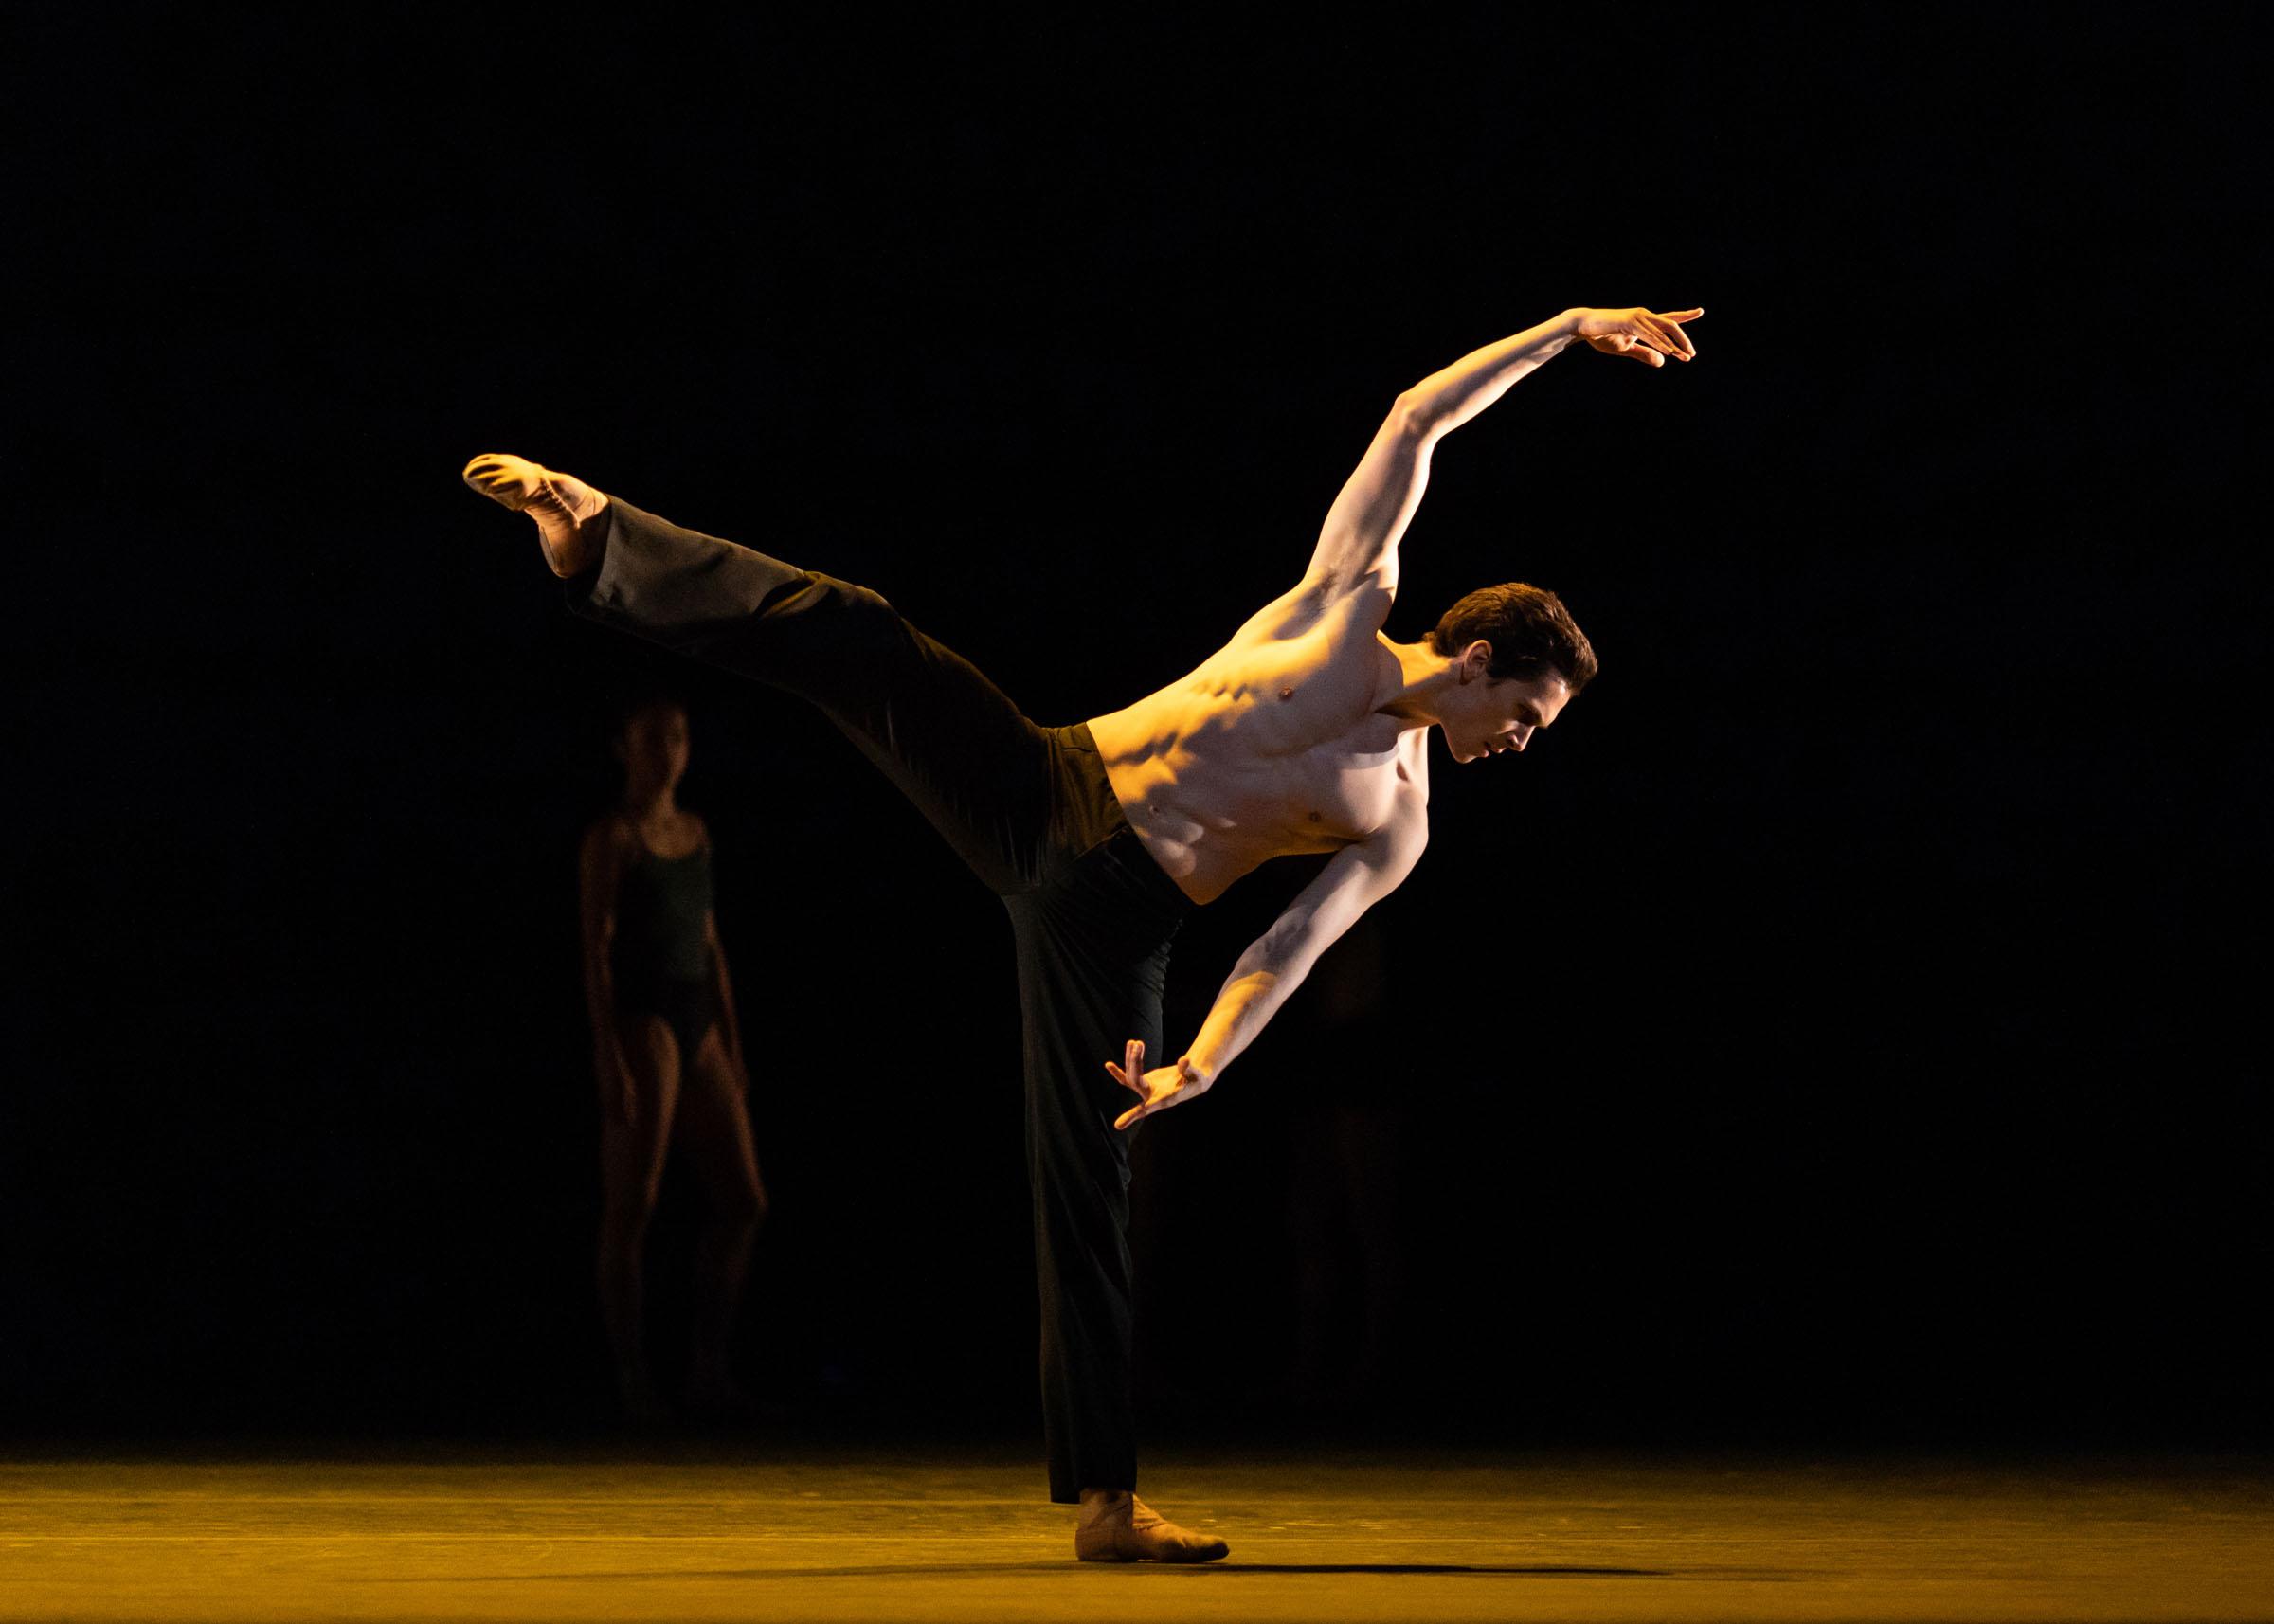 William Bracewell in Wayne McGregor's Infra, The Royal Ballet Season 2018/19